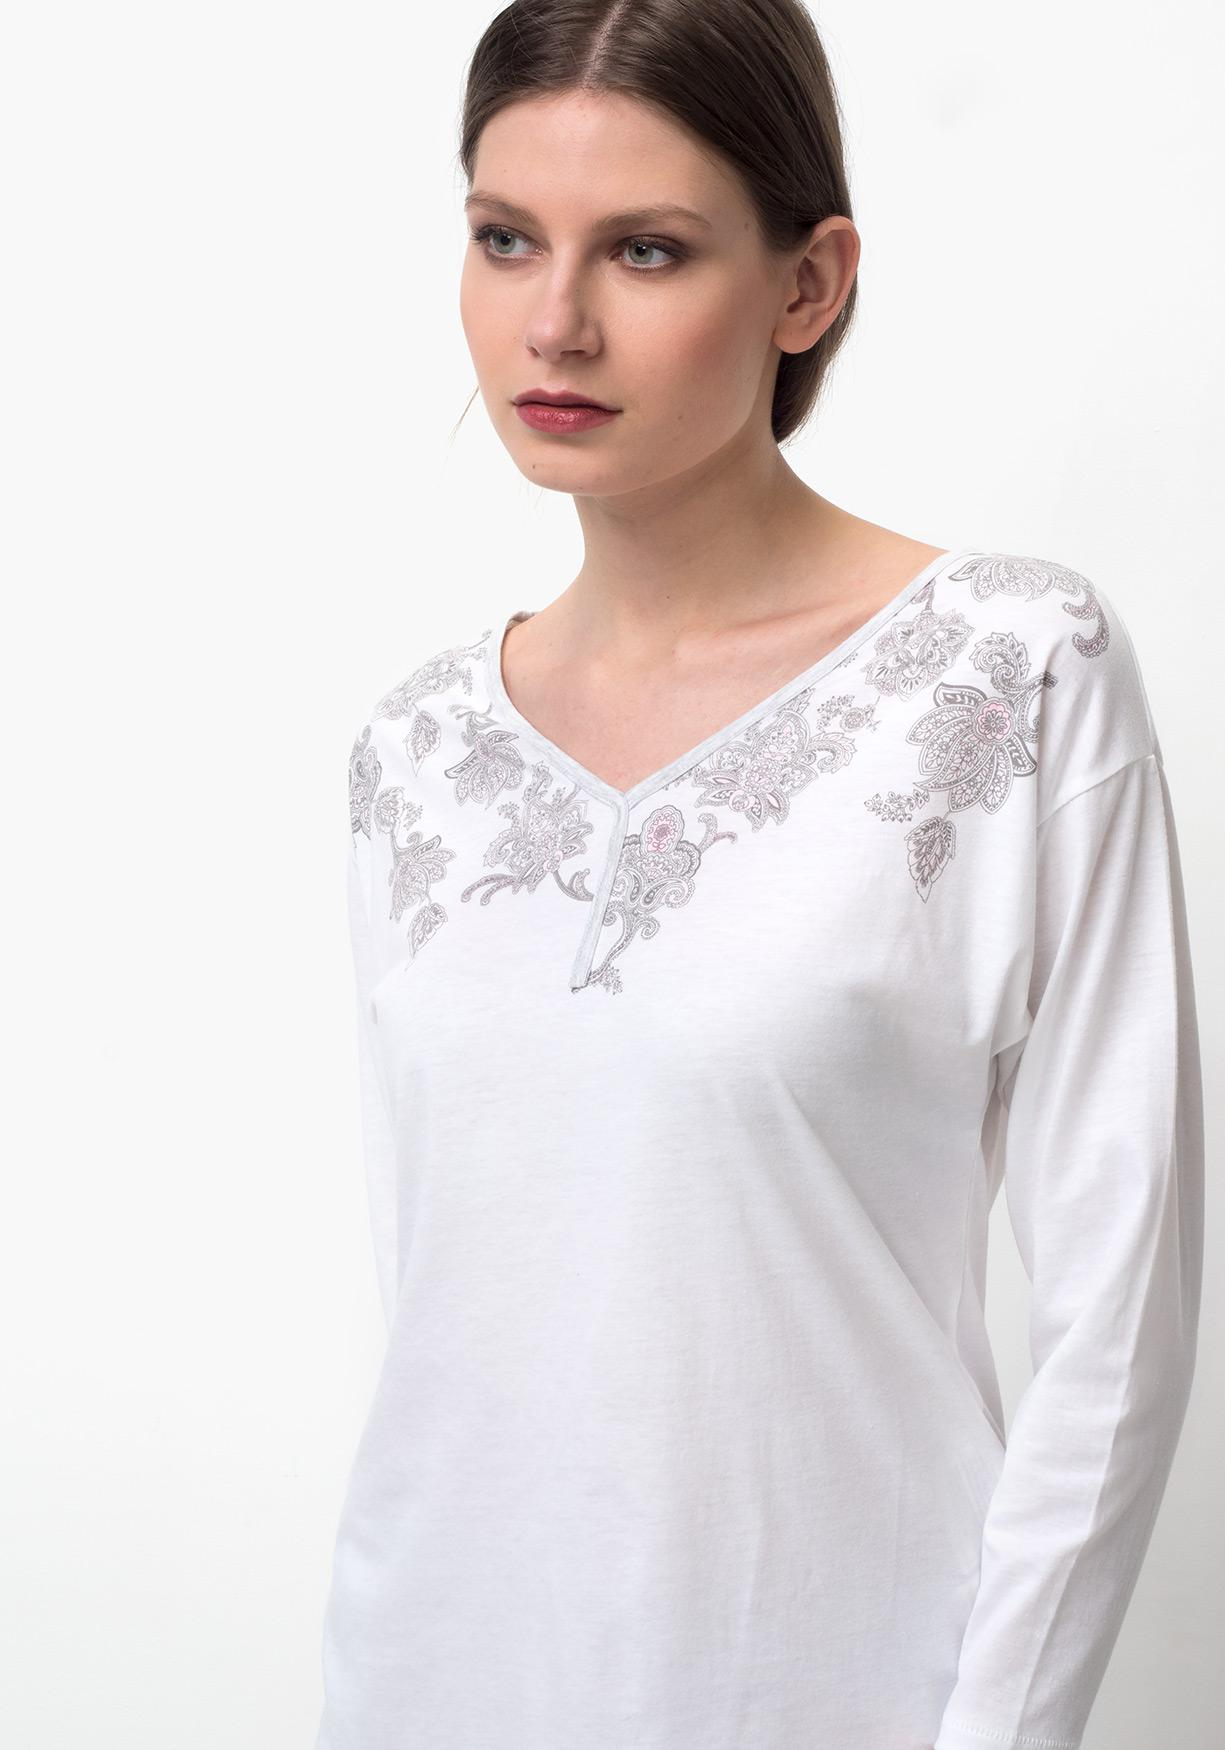 c4a84931d4 Comprar Camiseta lencería de mujer manga larga TEX. ¡Aprovéchate de ...